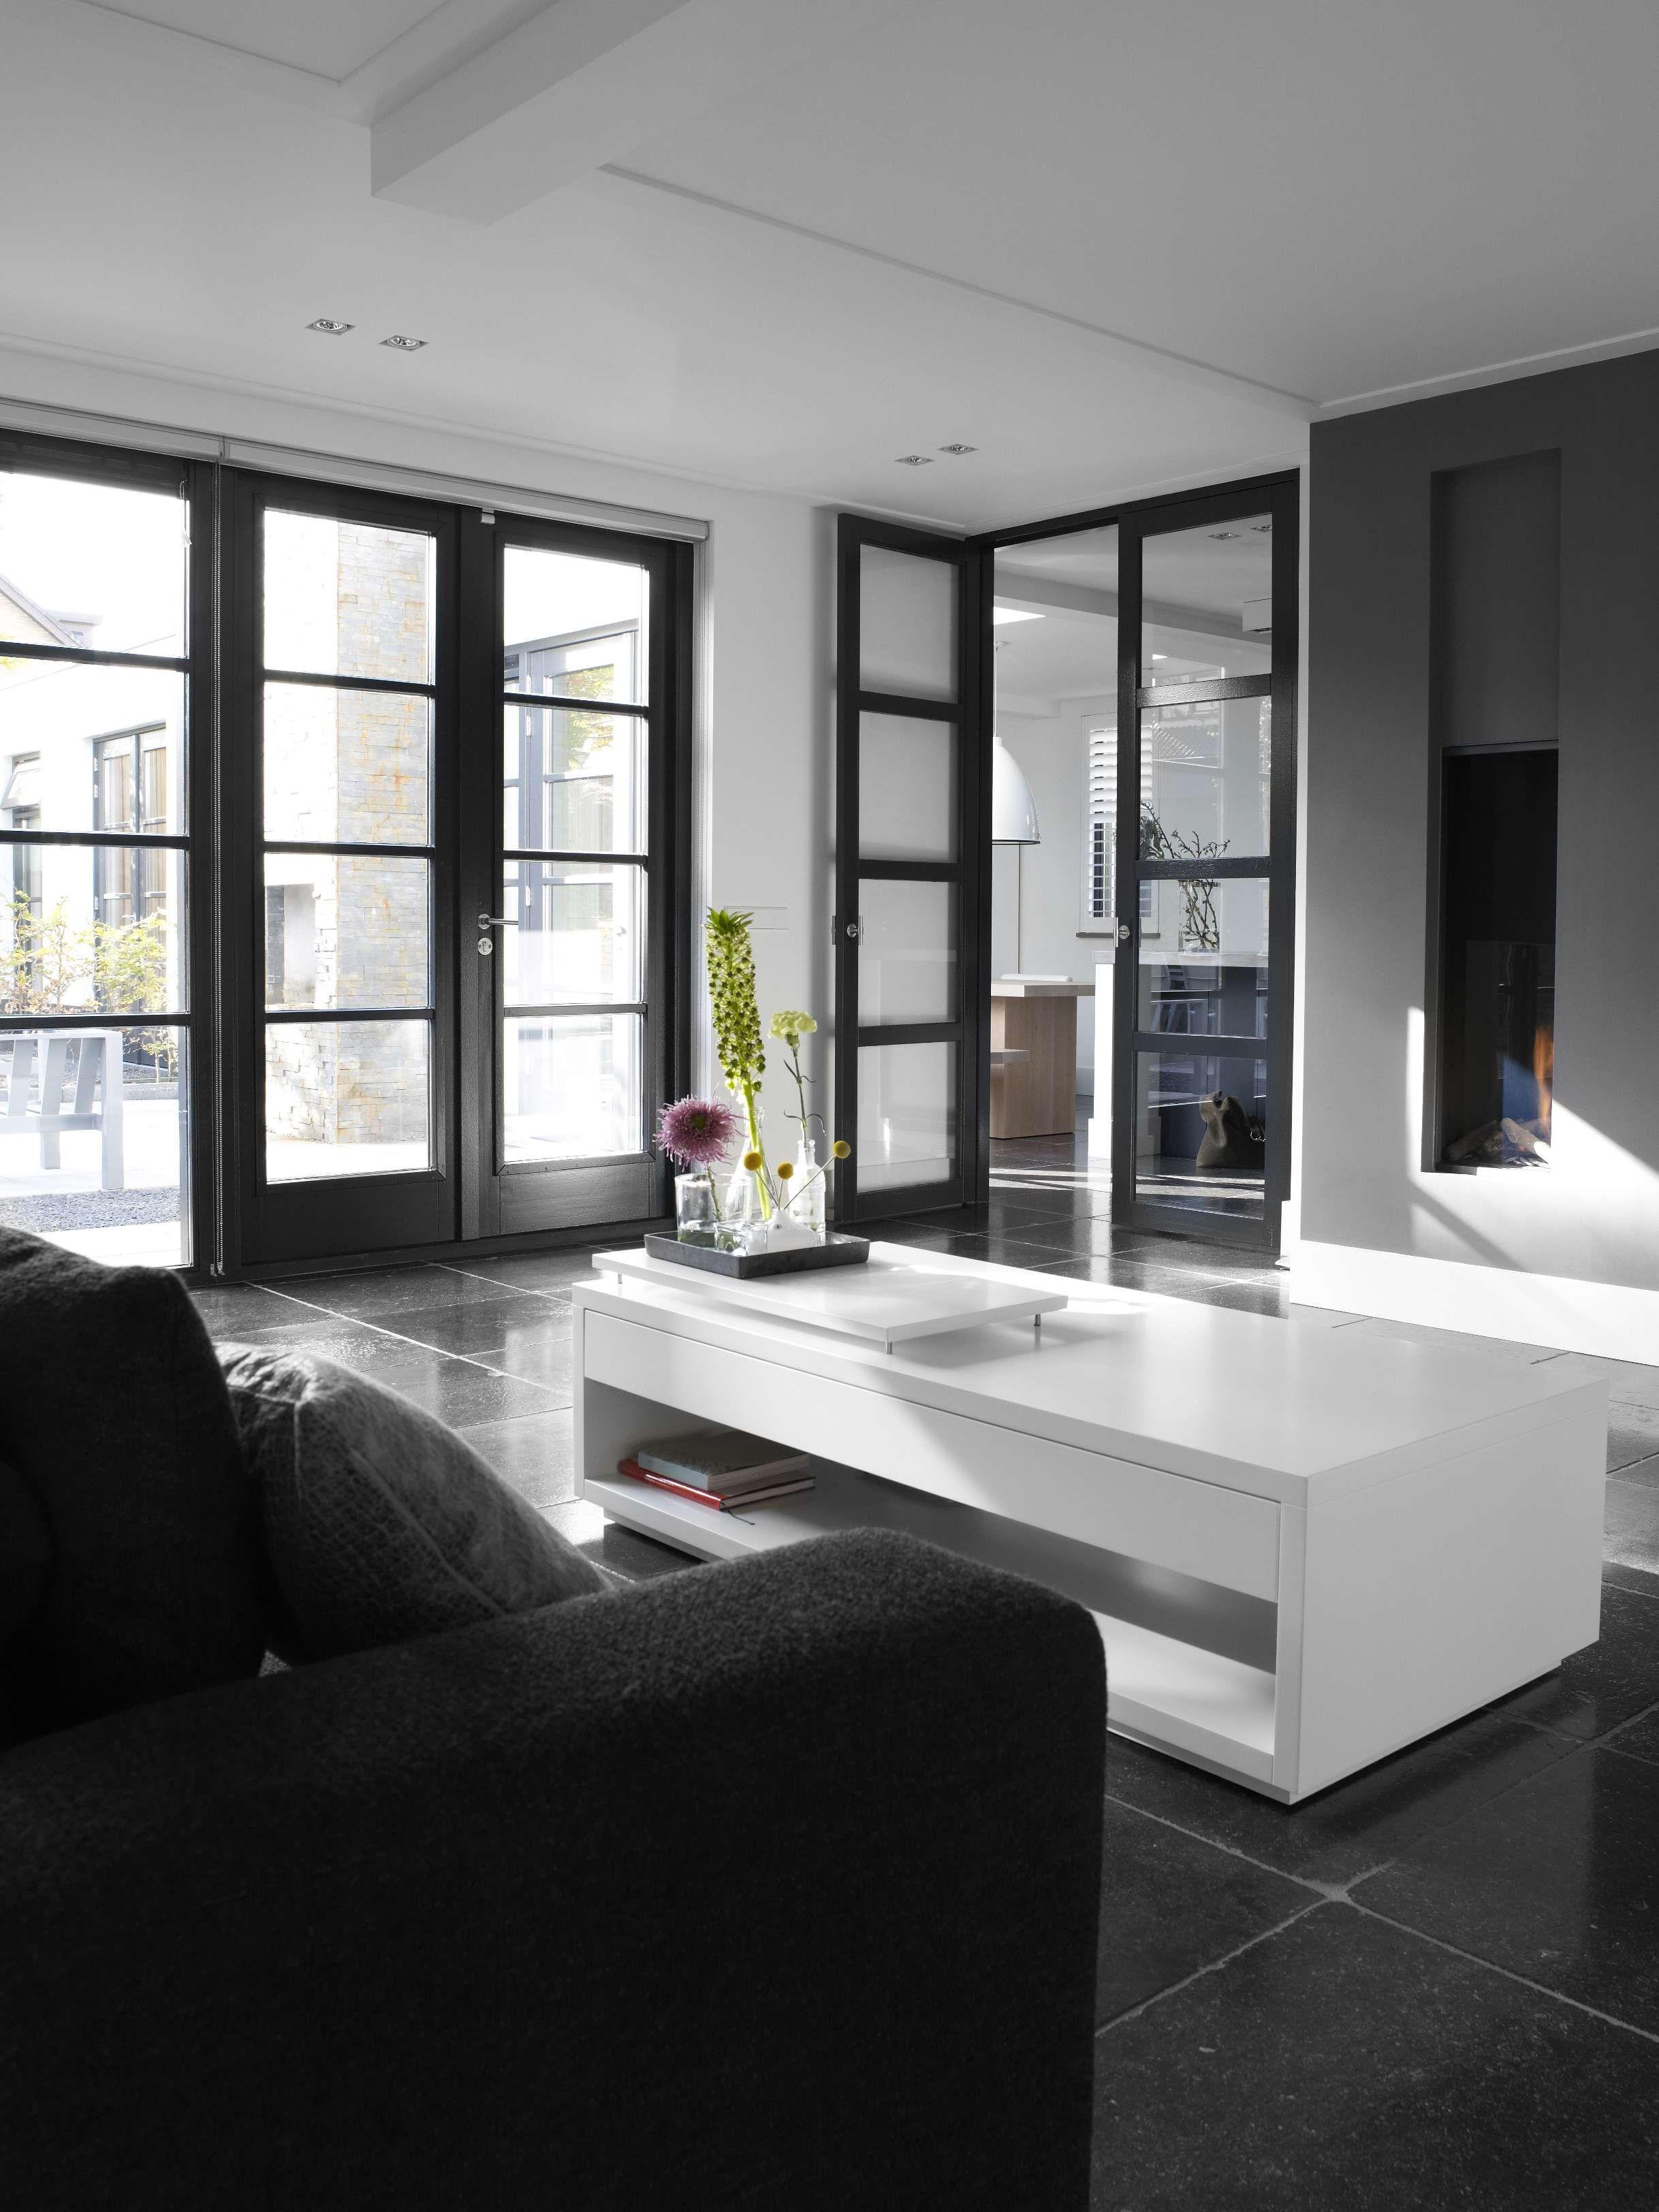 Black N White Ramen En Kozijnen Interieur Woonkamer Interieur